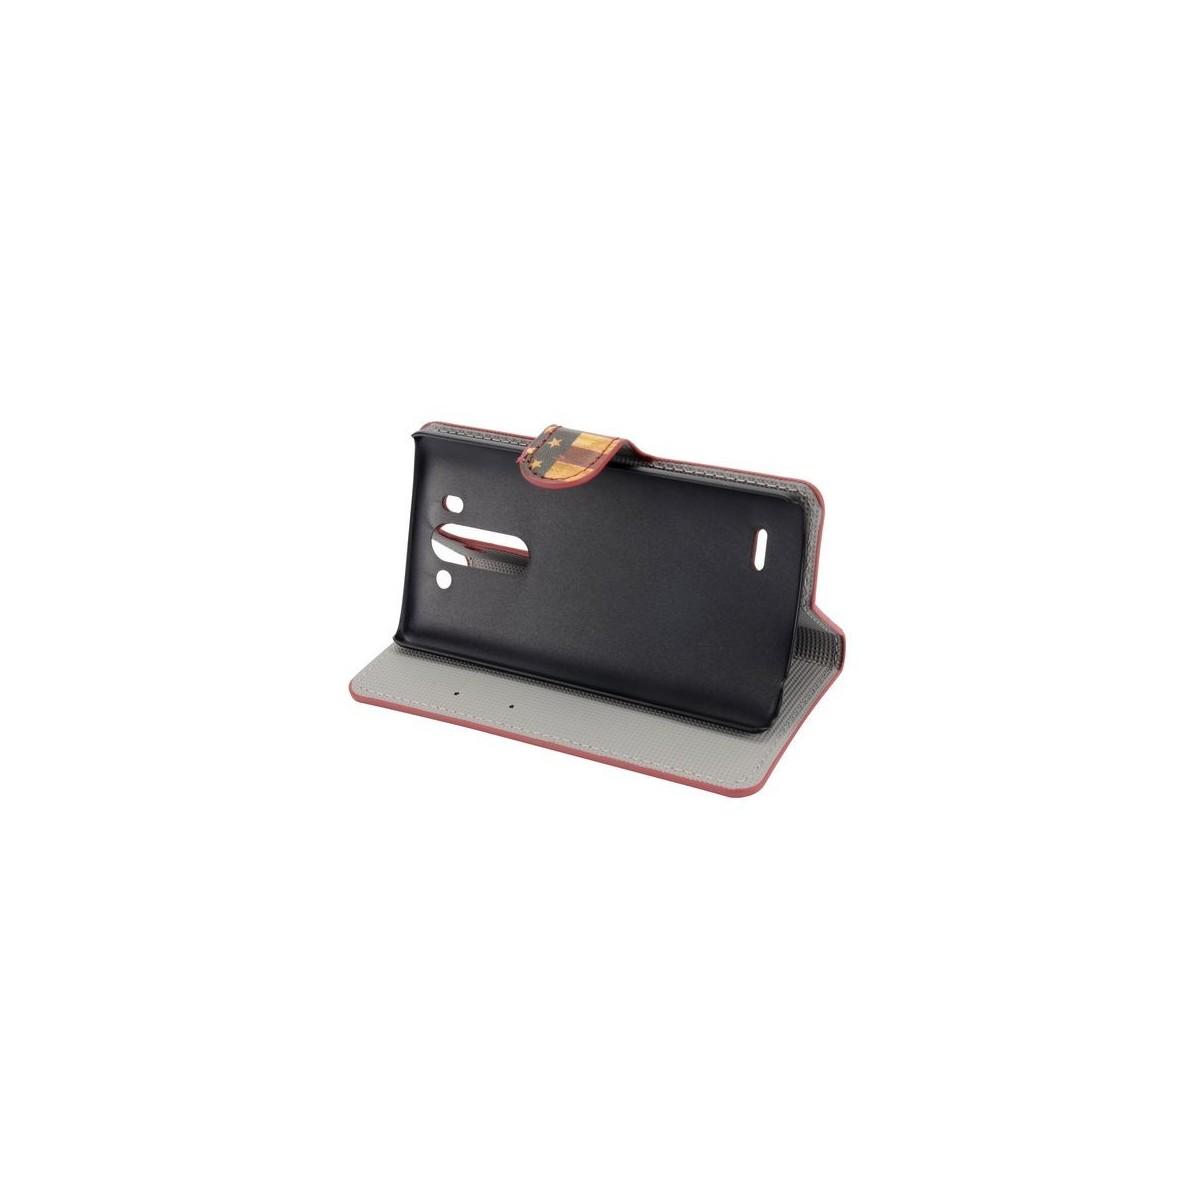 Crazy Kase - Etui LG G3s Motif Drapeau USA Vintage